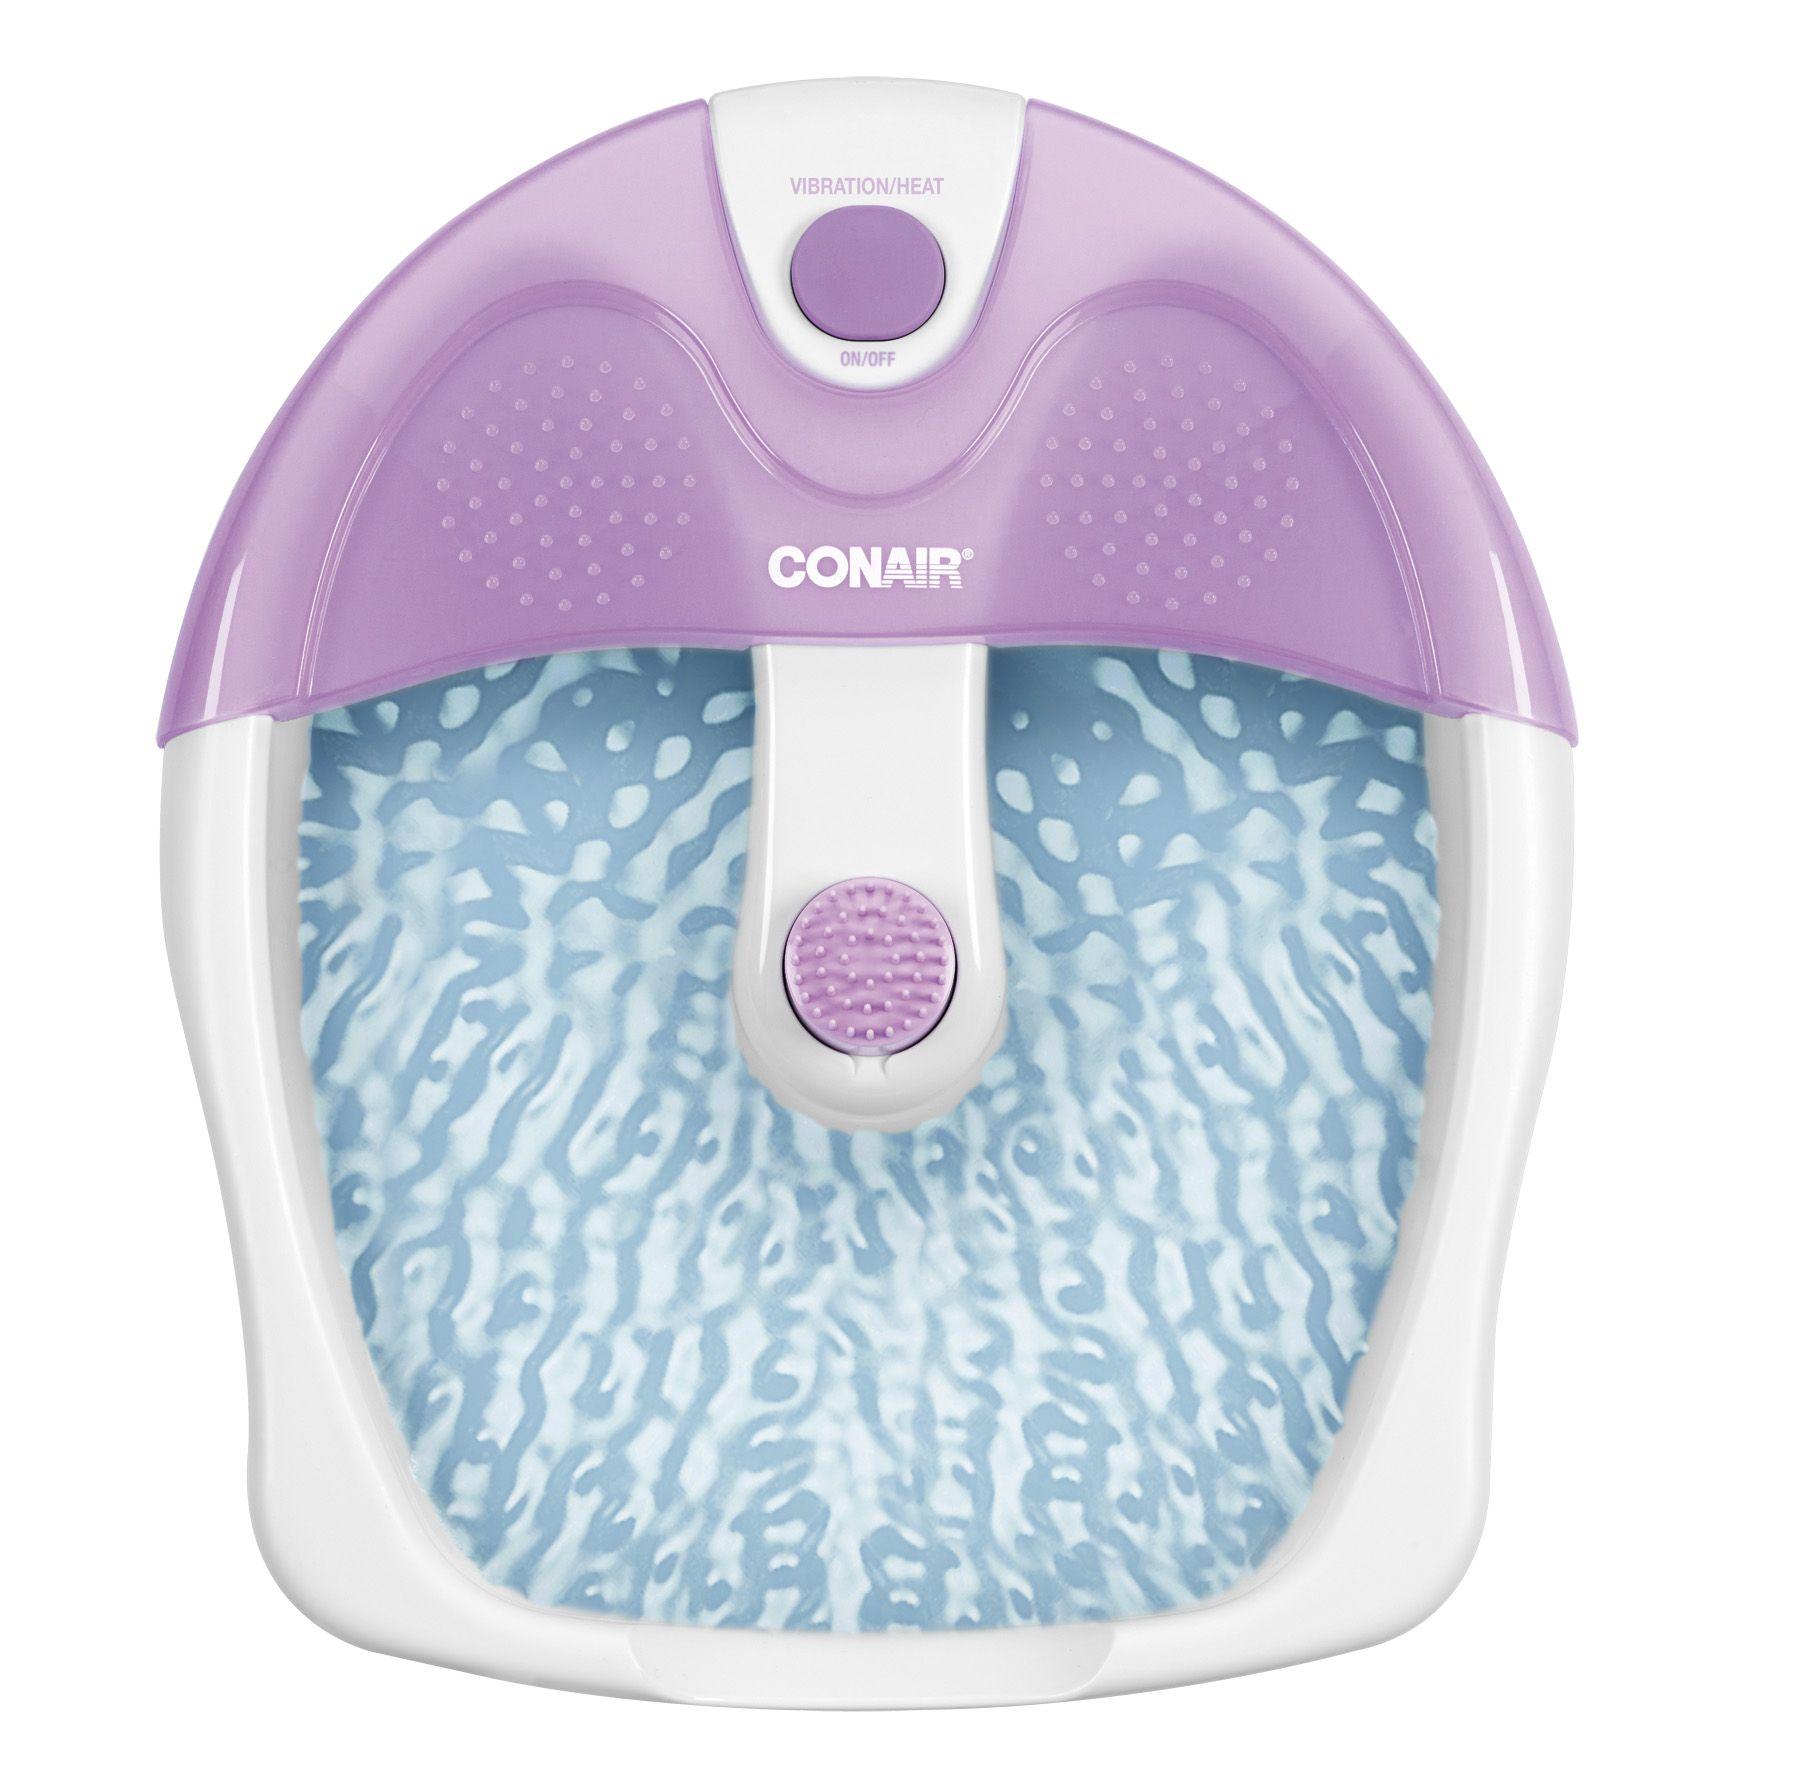 Conair Foot Bath FB3S - CONAIR CORPORATION